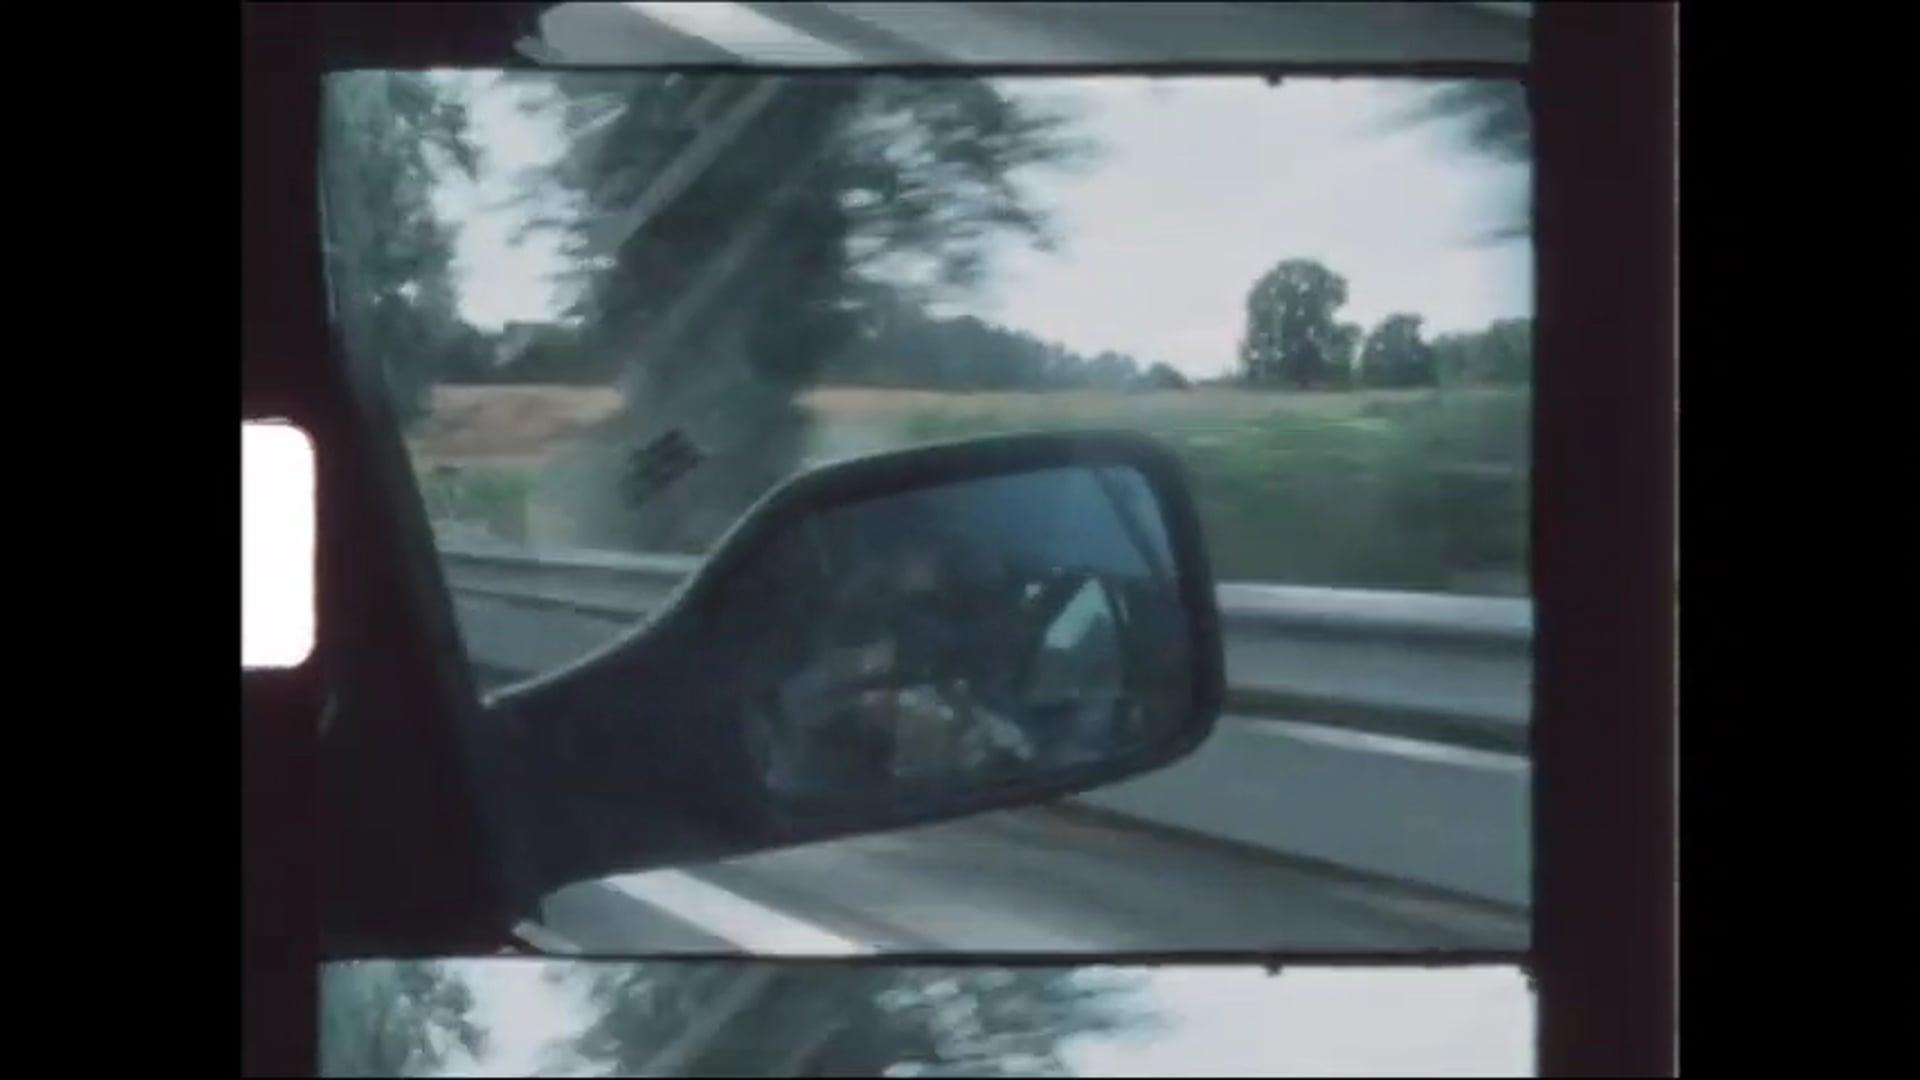 SHORT VIDEO'S